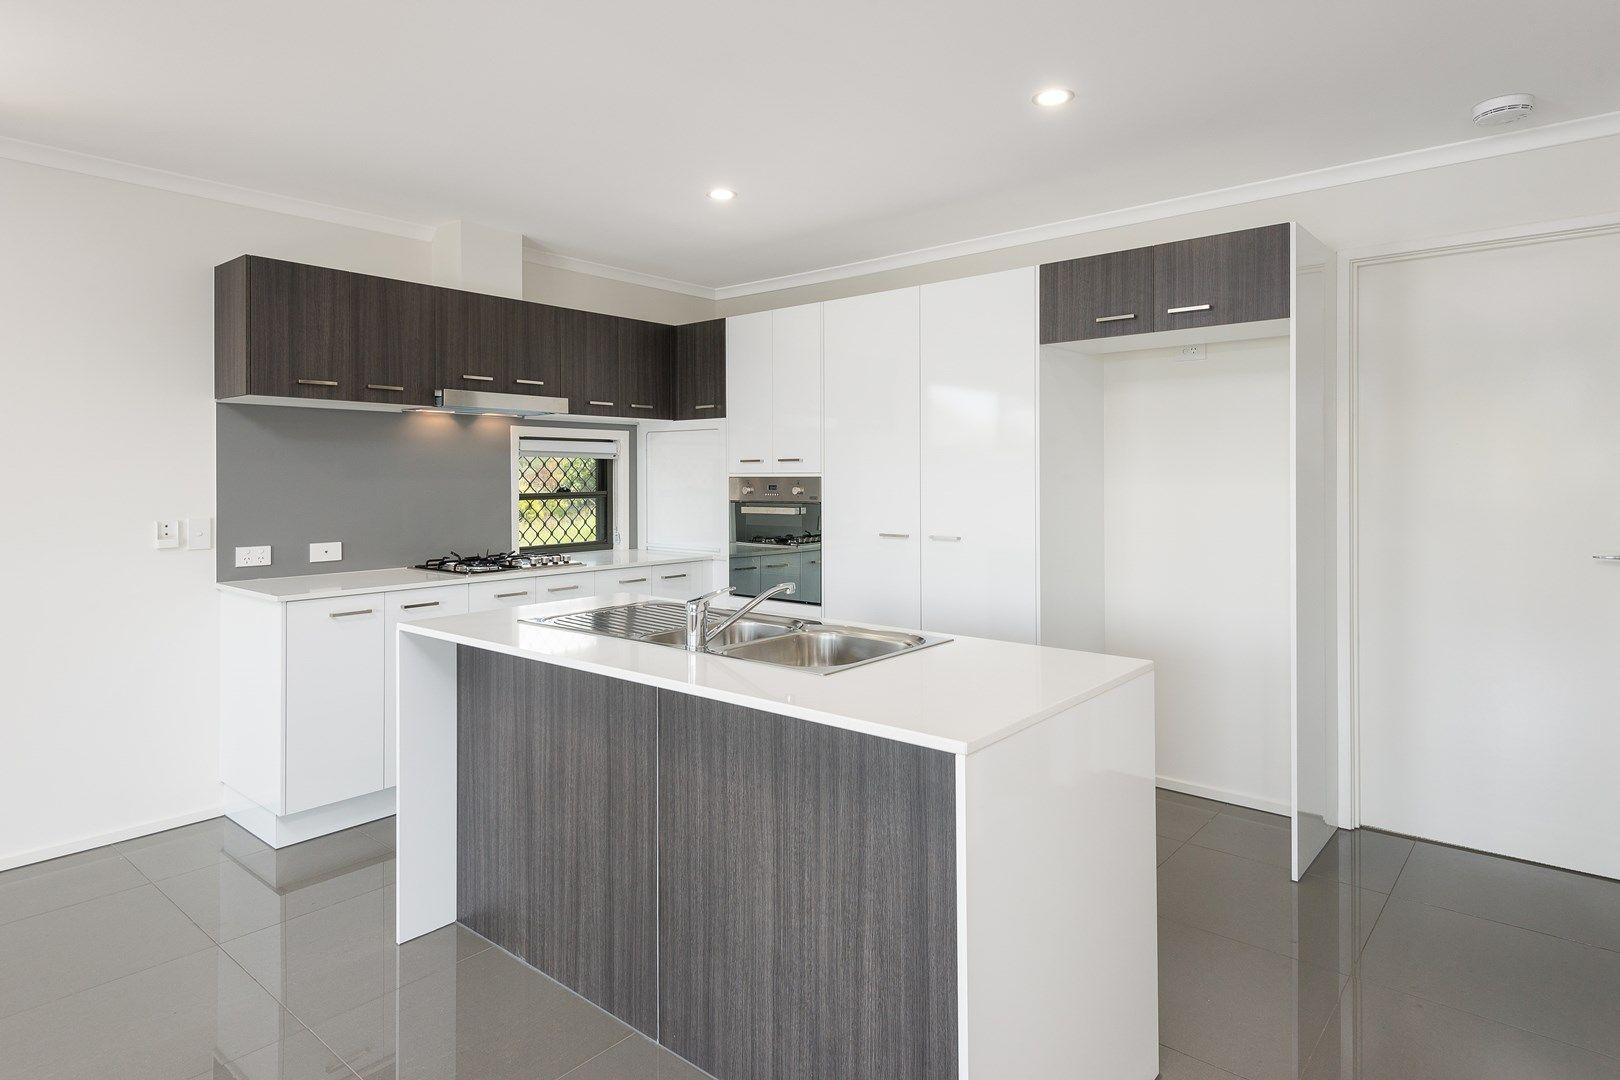 20/111 Soames Street, Everton Park QLD 4053, Image 0